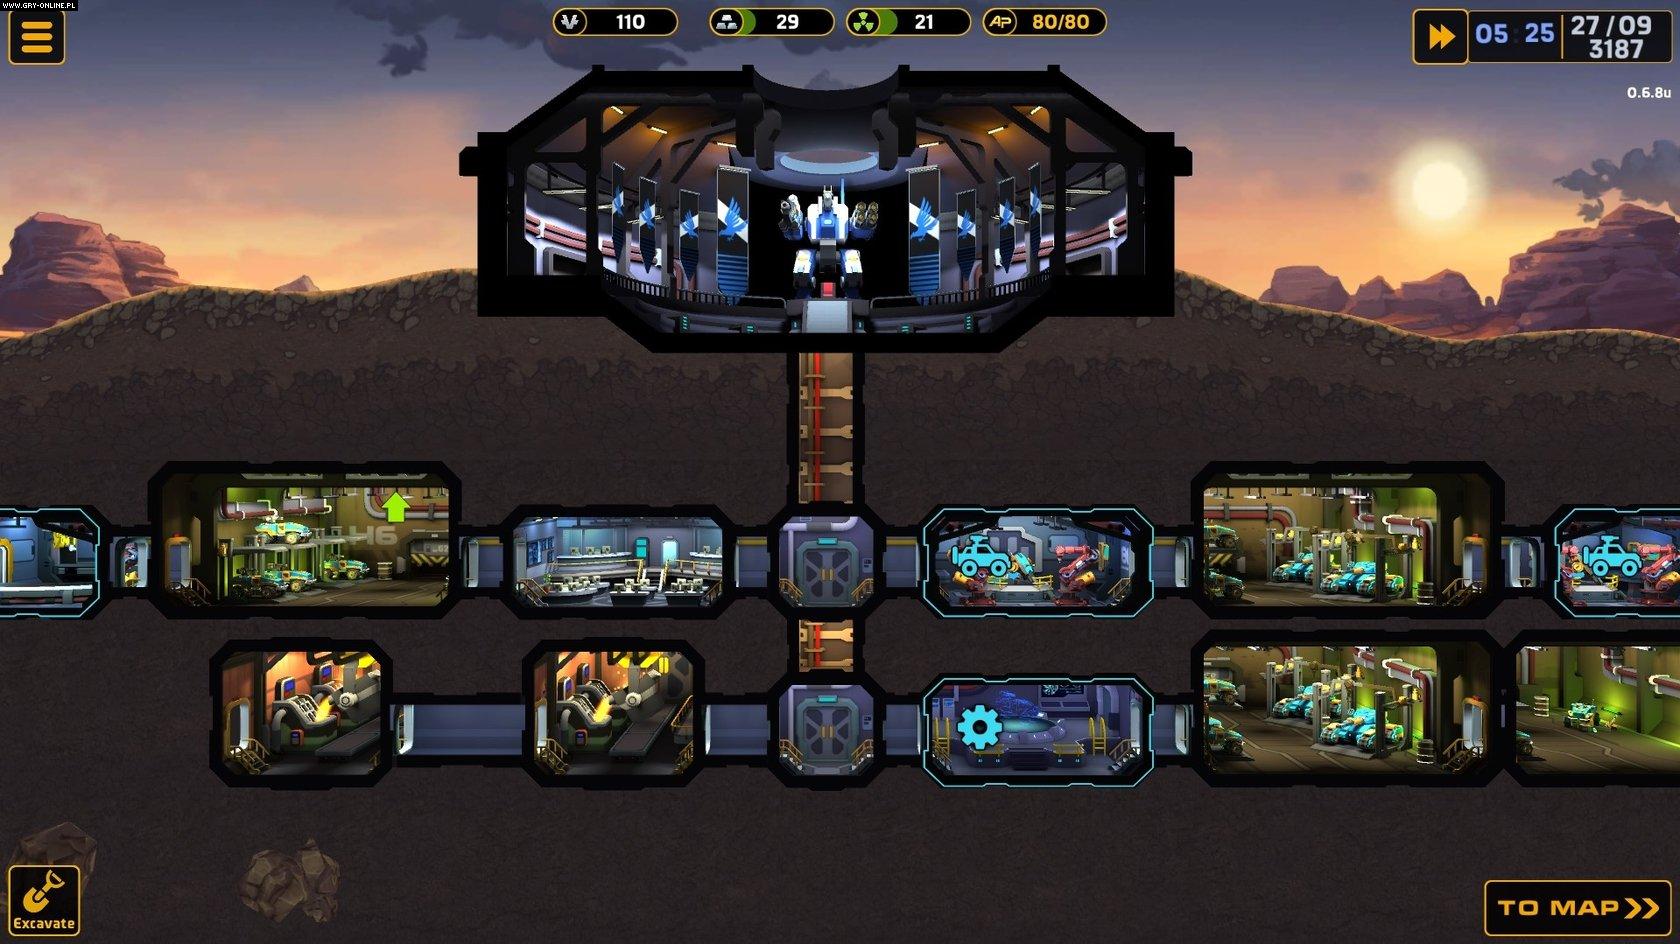 Codex of Victory PC Games Image 4/14, Ino-Co, 1C